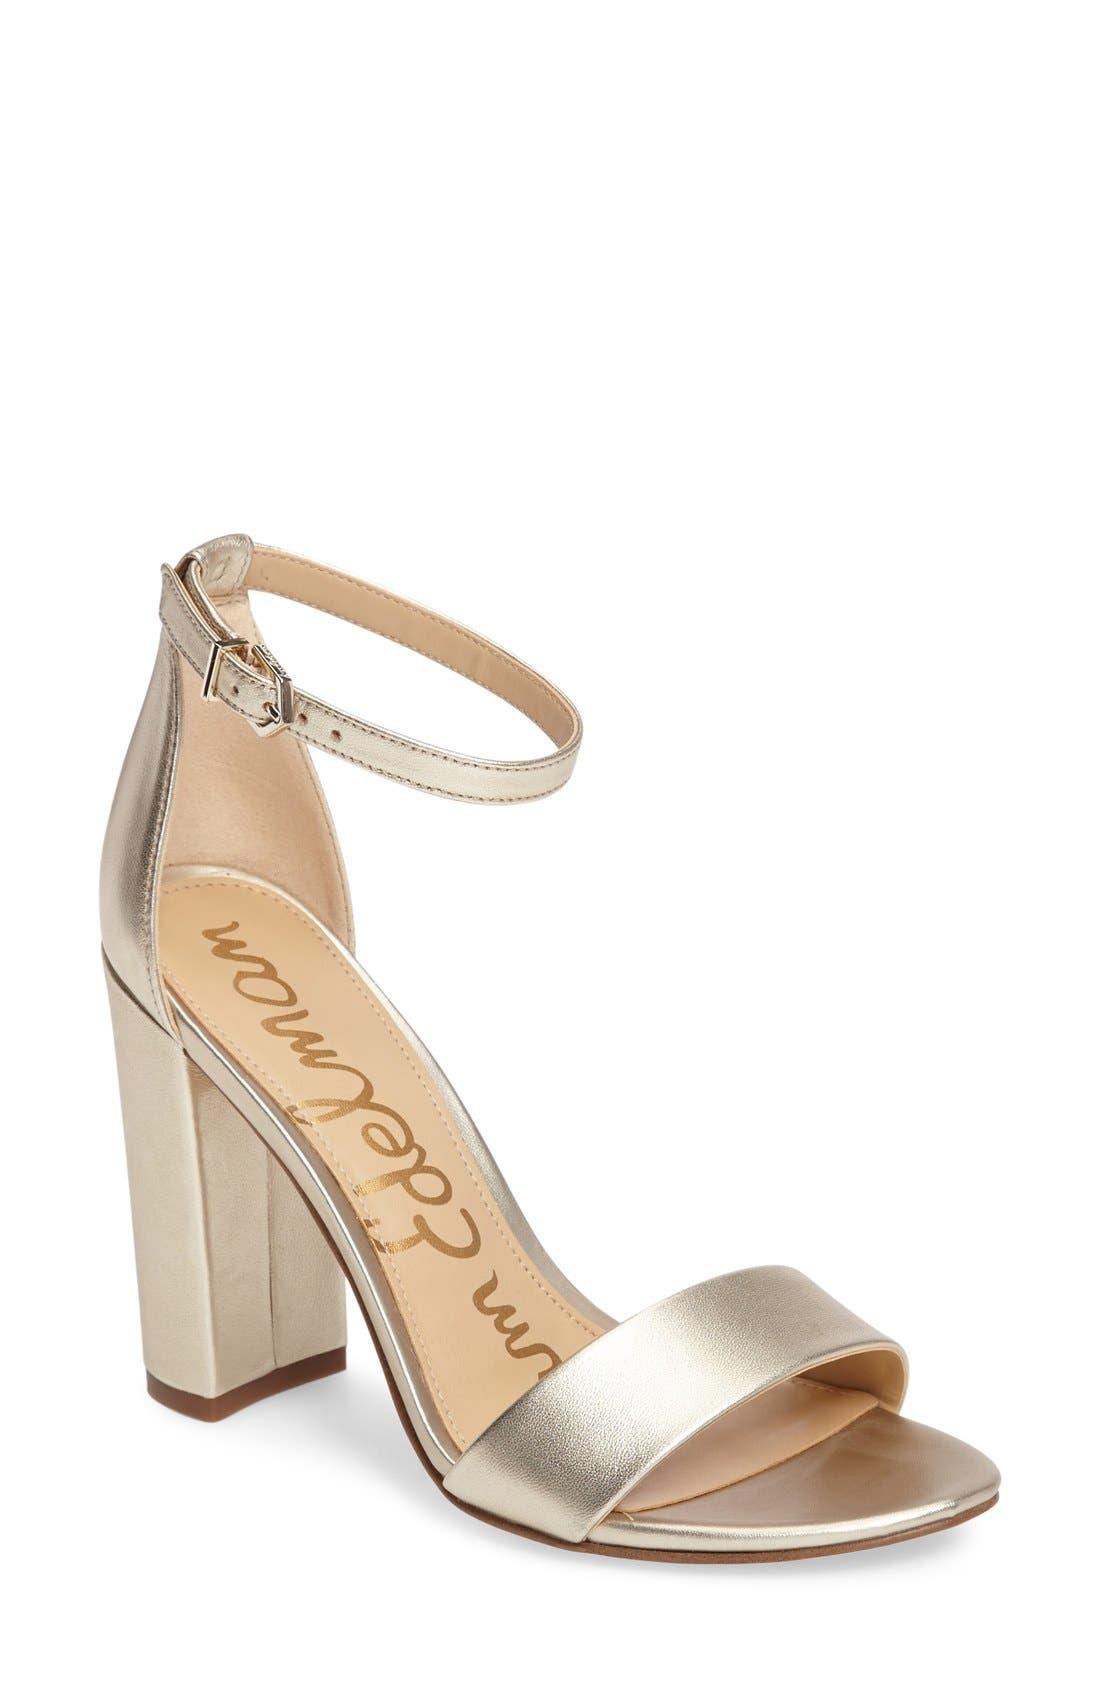 Off-White Heels & High-Heel Shoes for Women | Nordstrom